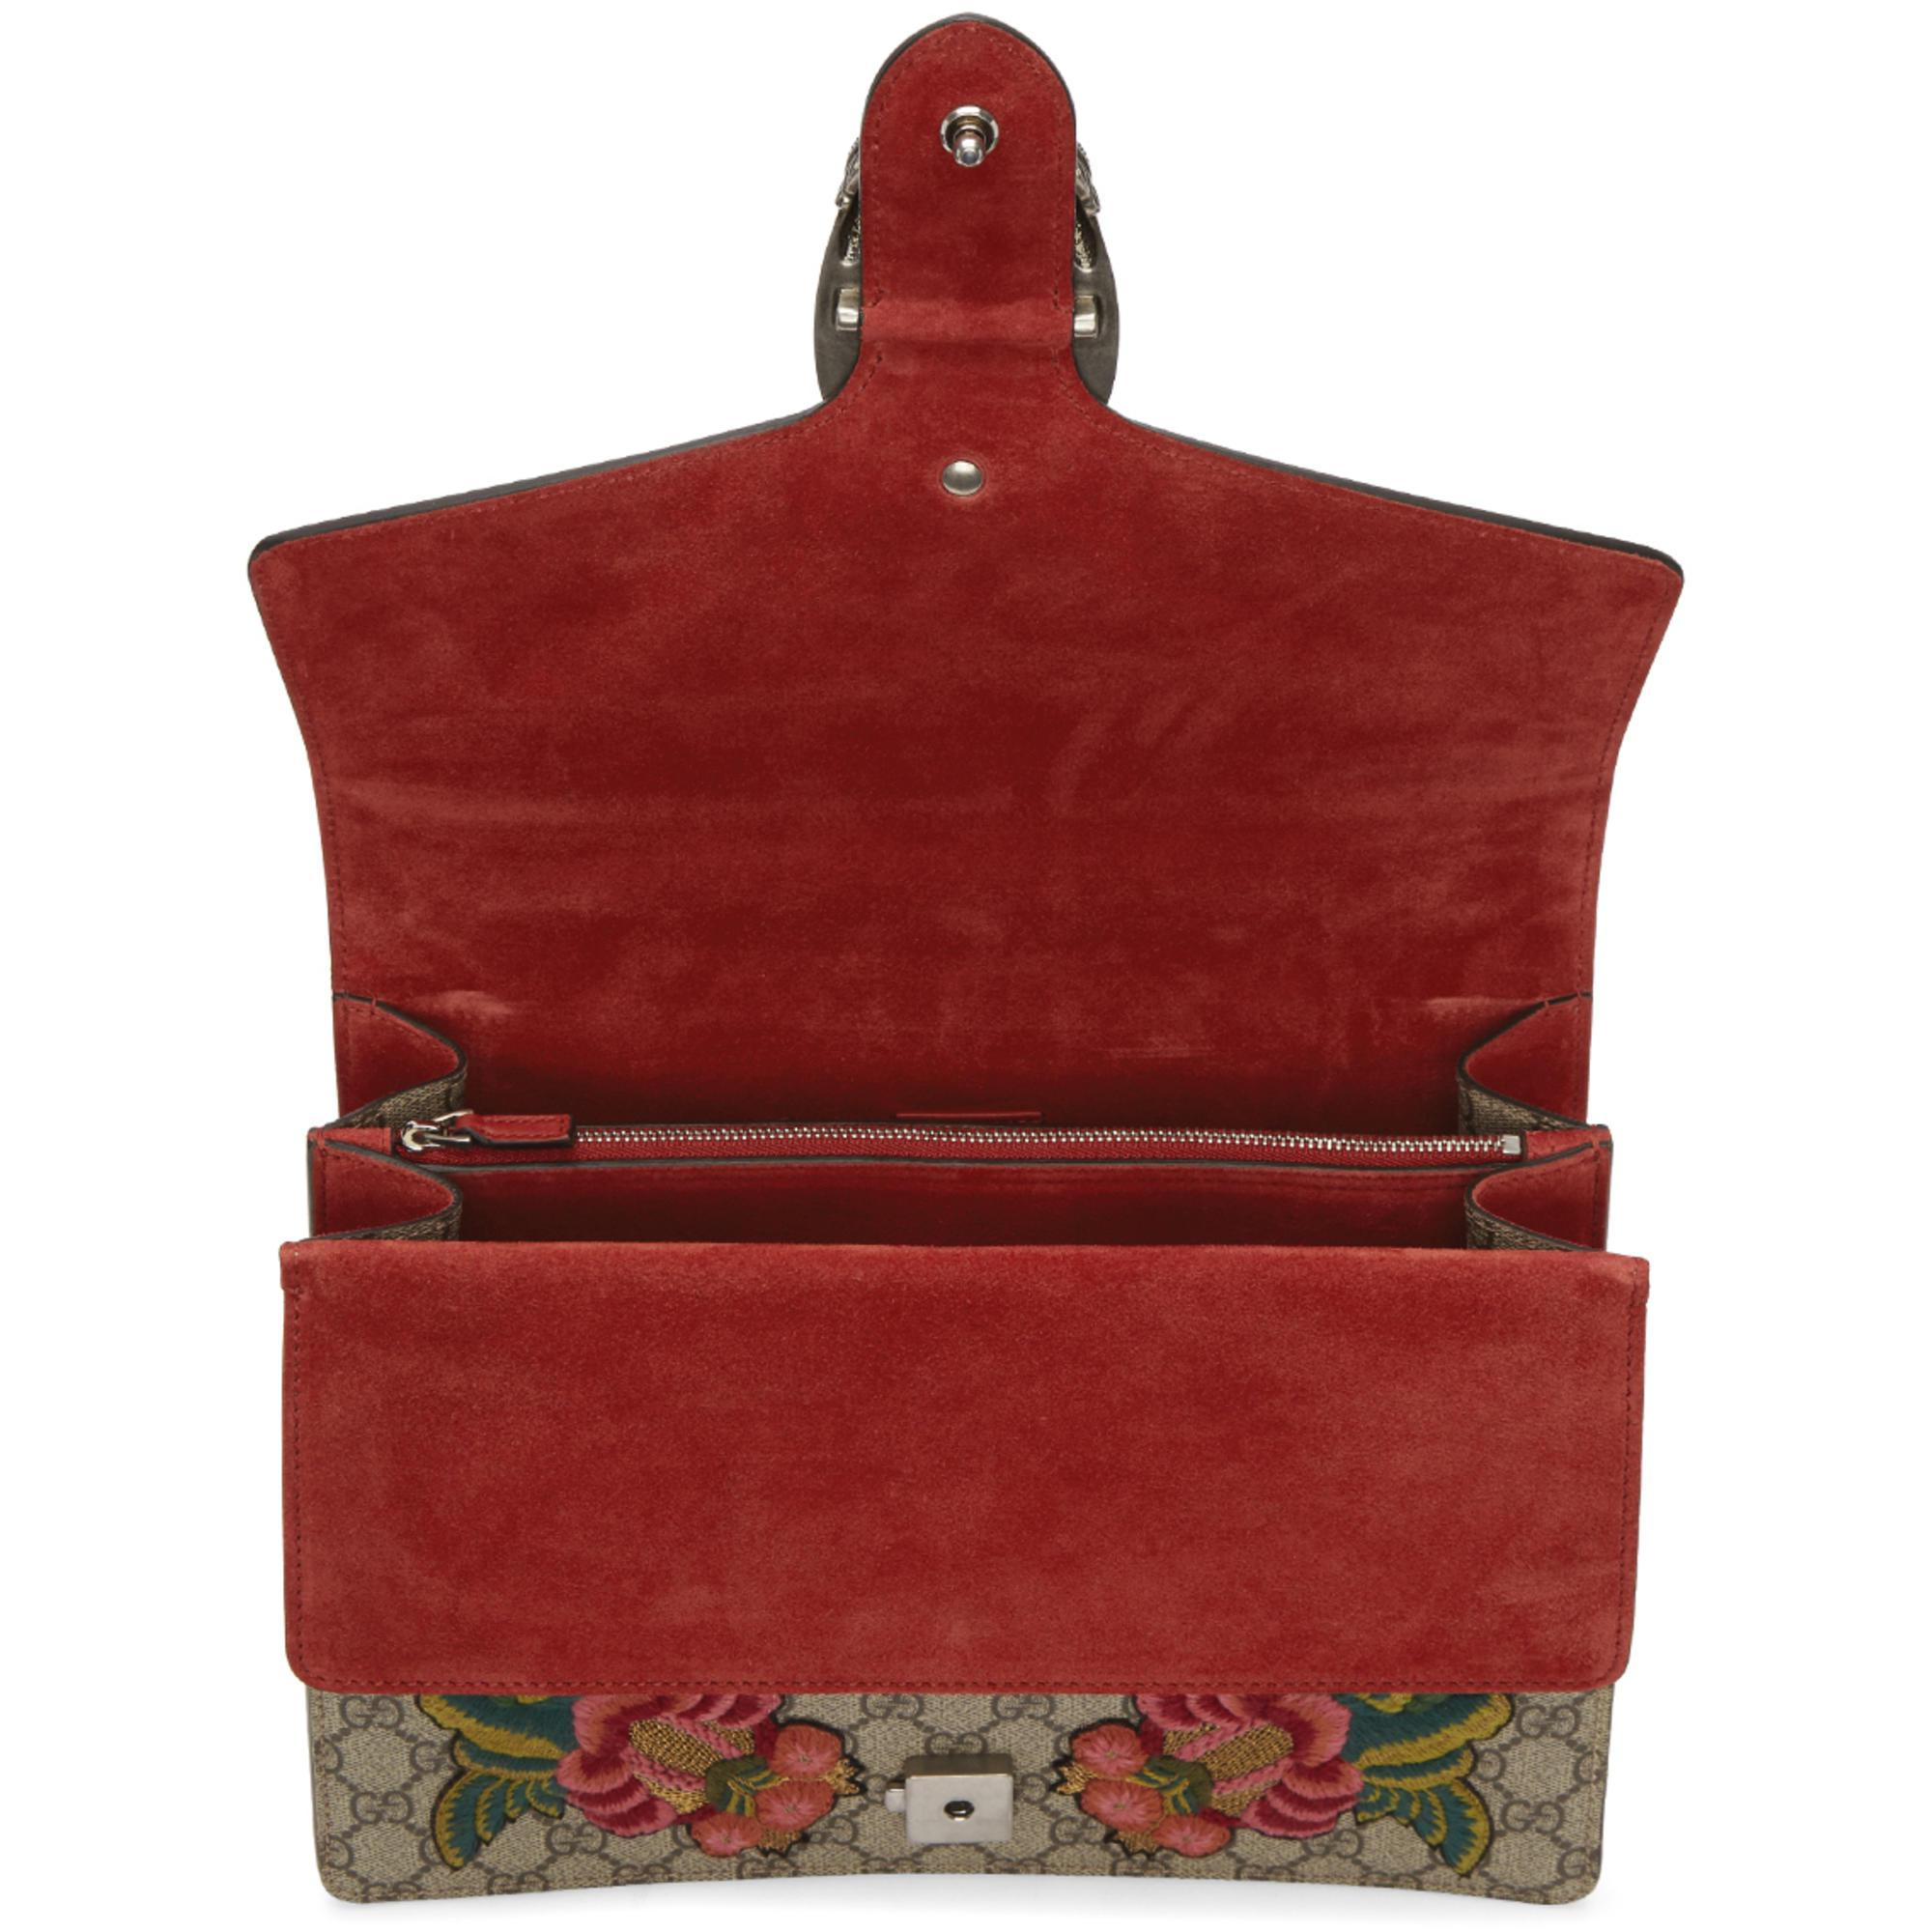 7360df5bb Gucci Multicolor Medium Gg Supreme Dionysus Floral Moth Bag - Lyst